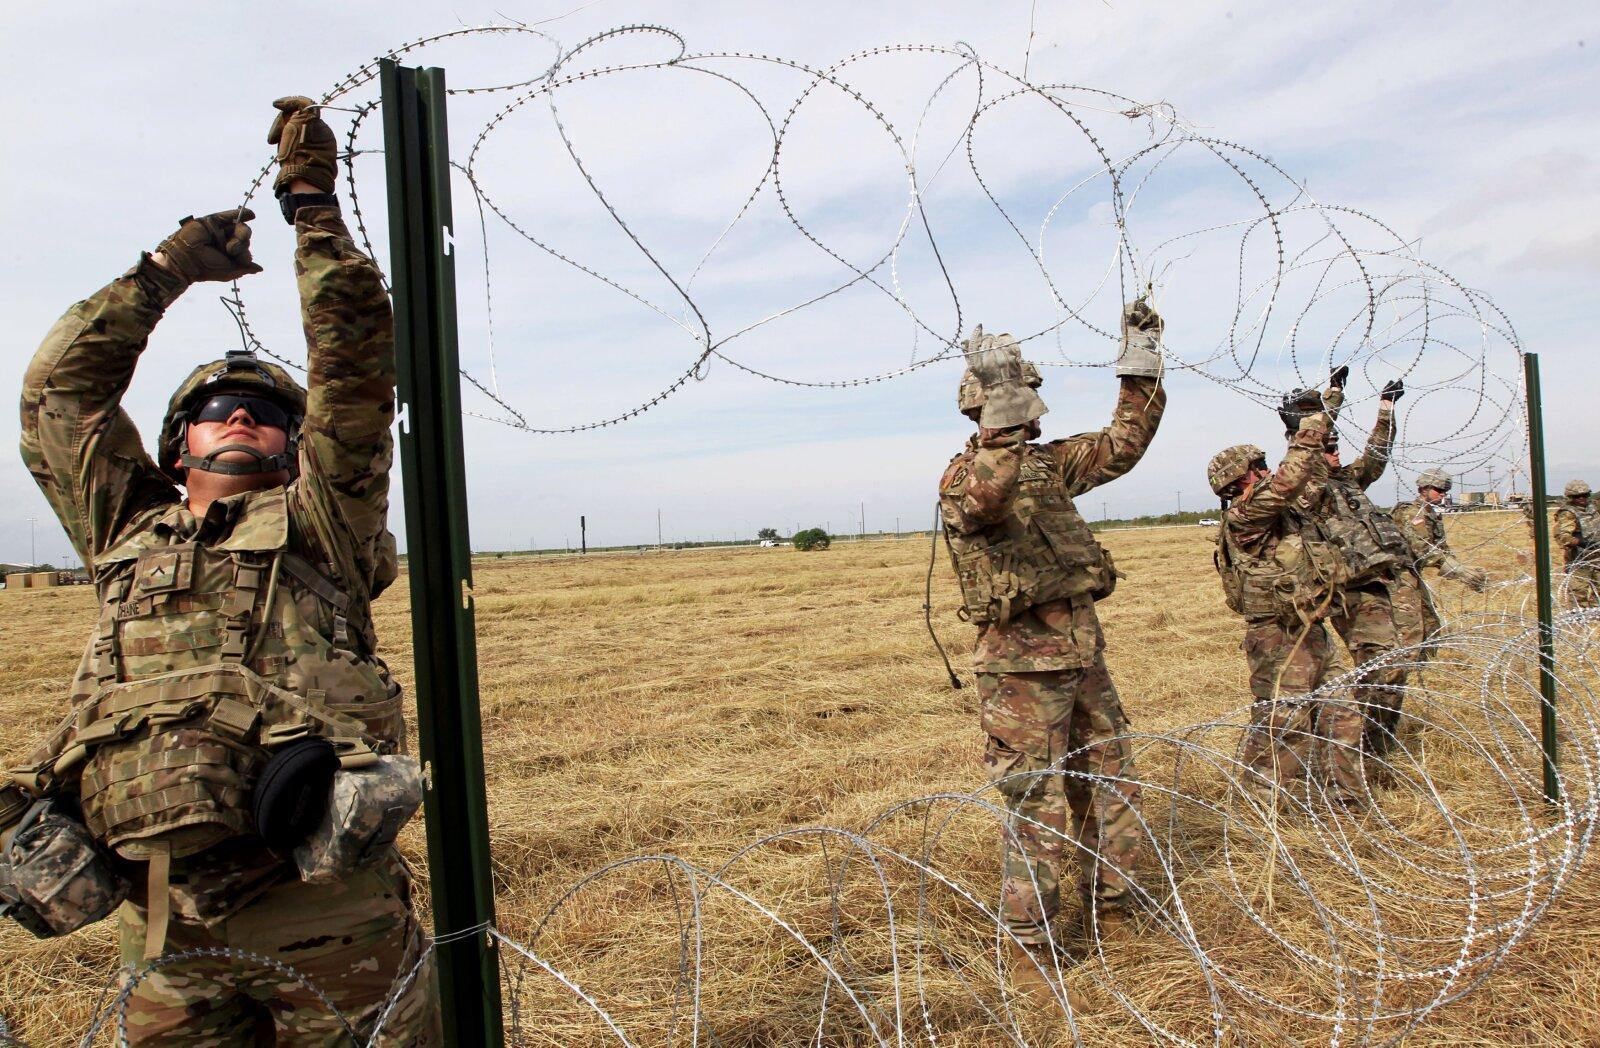 Frontera resguardada